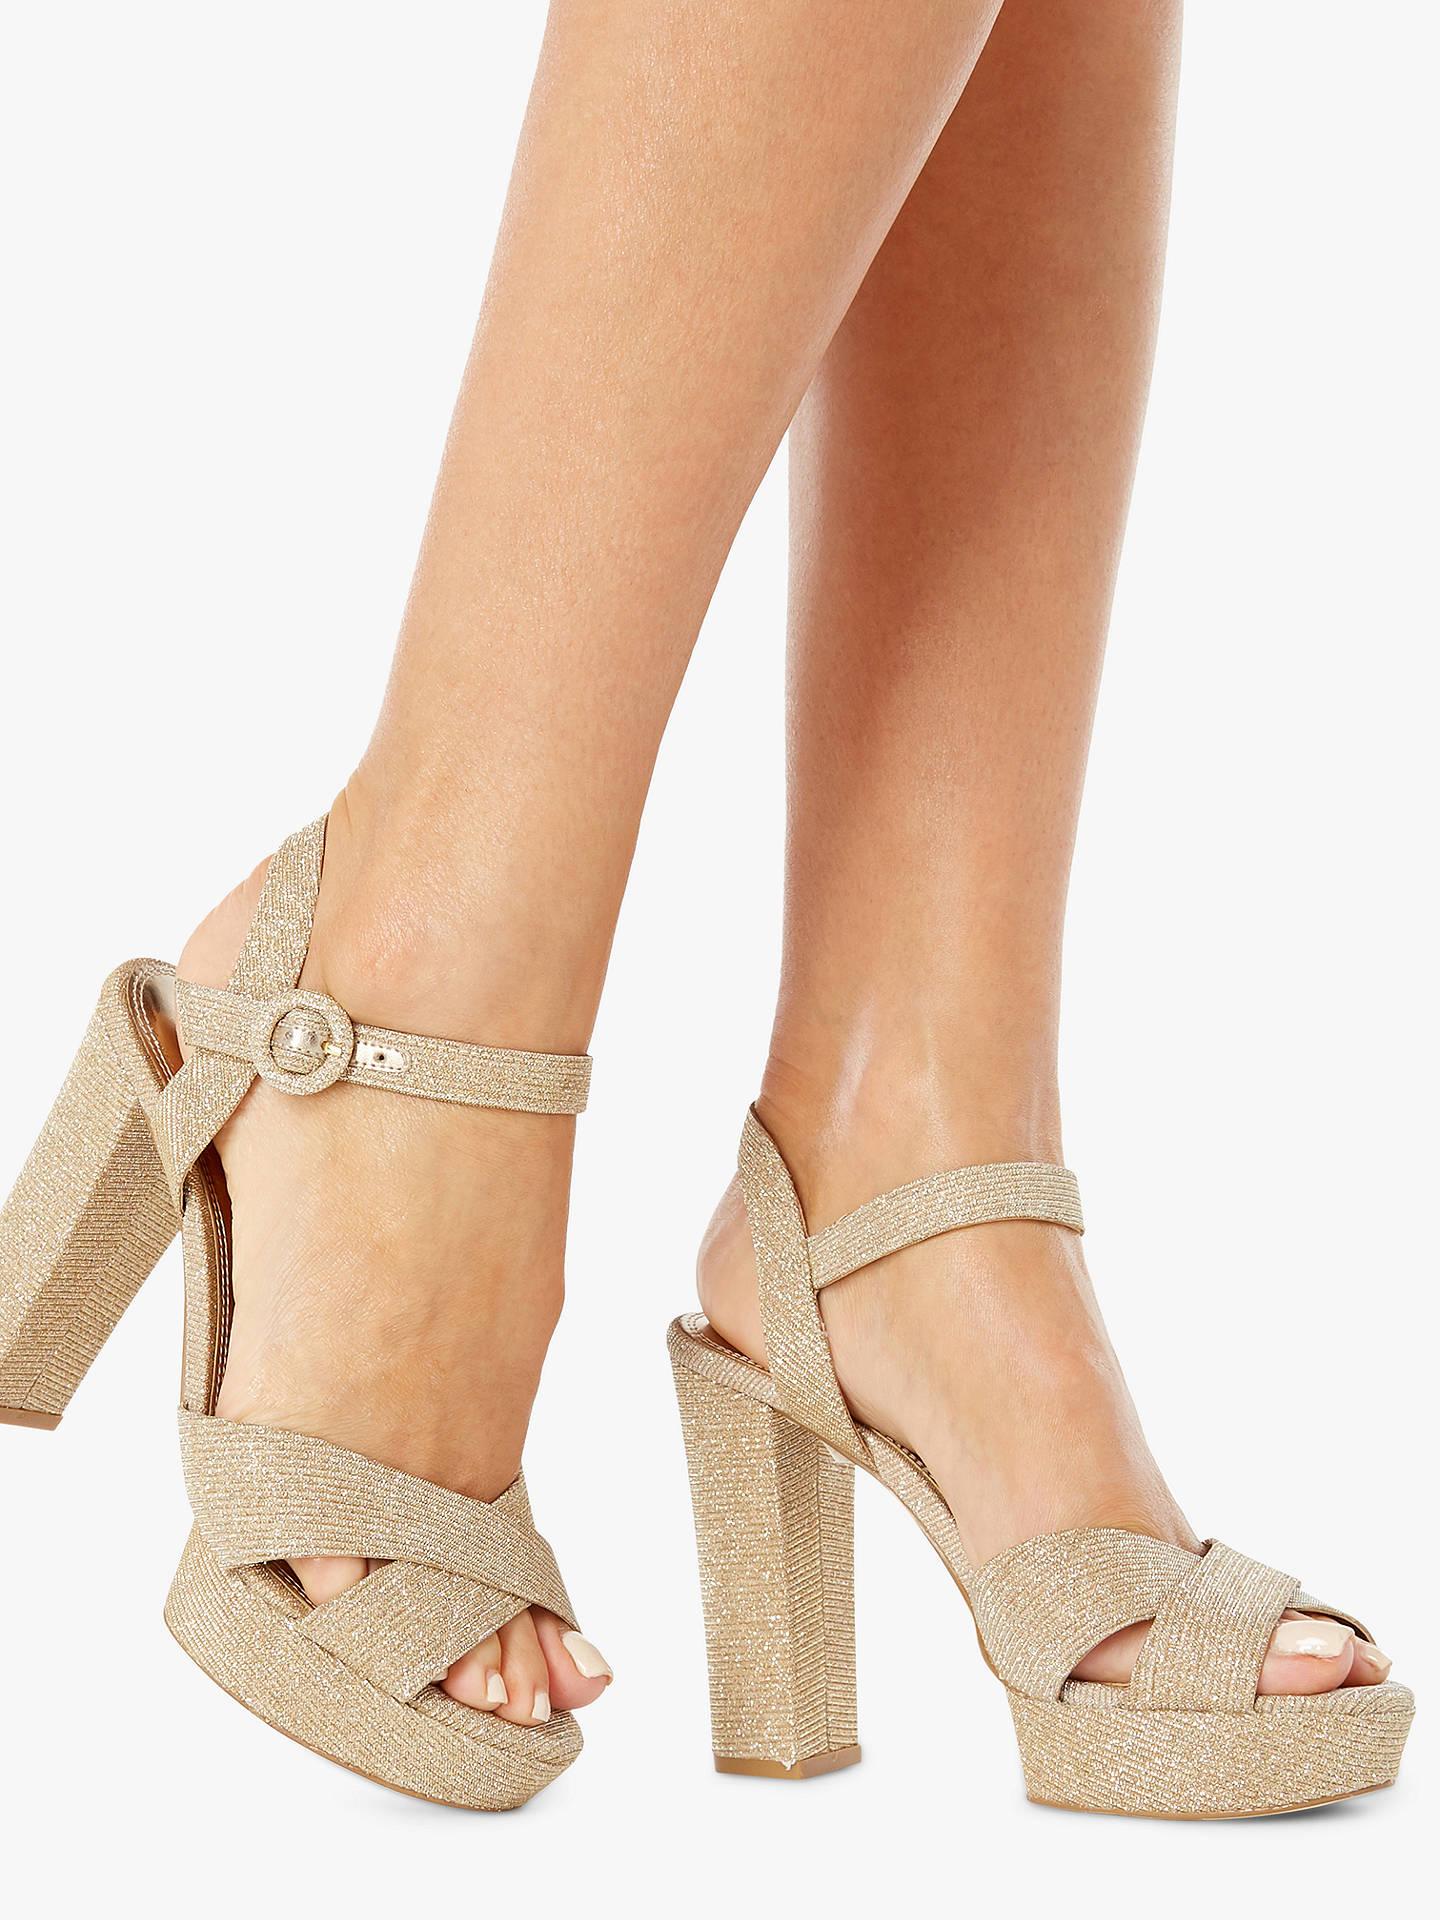 fc30817ae3f3 ... Buy Dune Mallin Platform Heeled Sandals